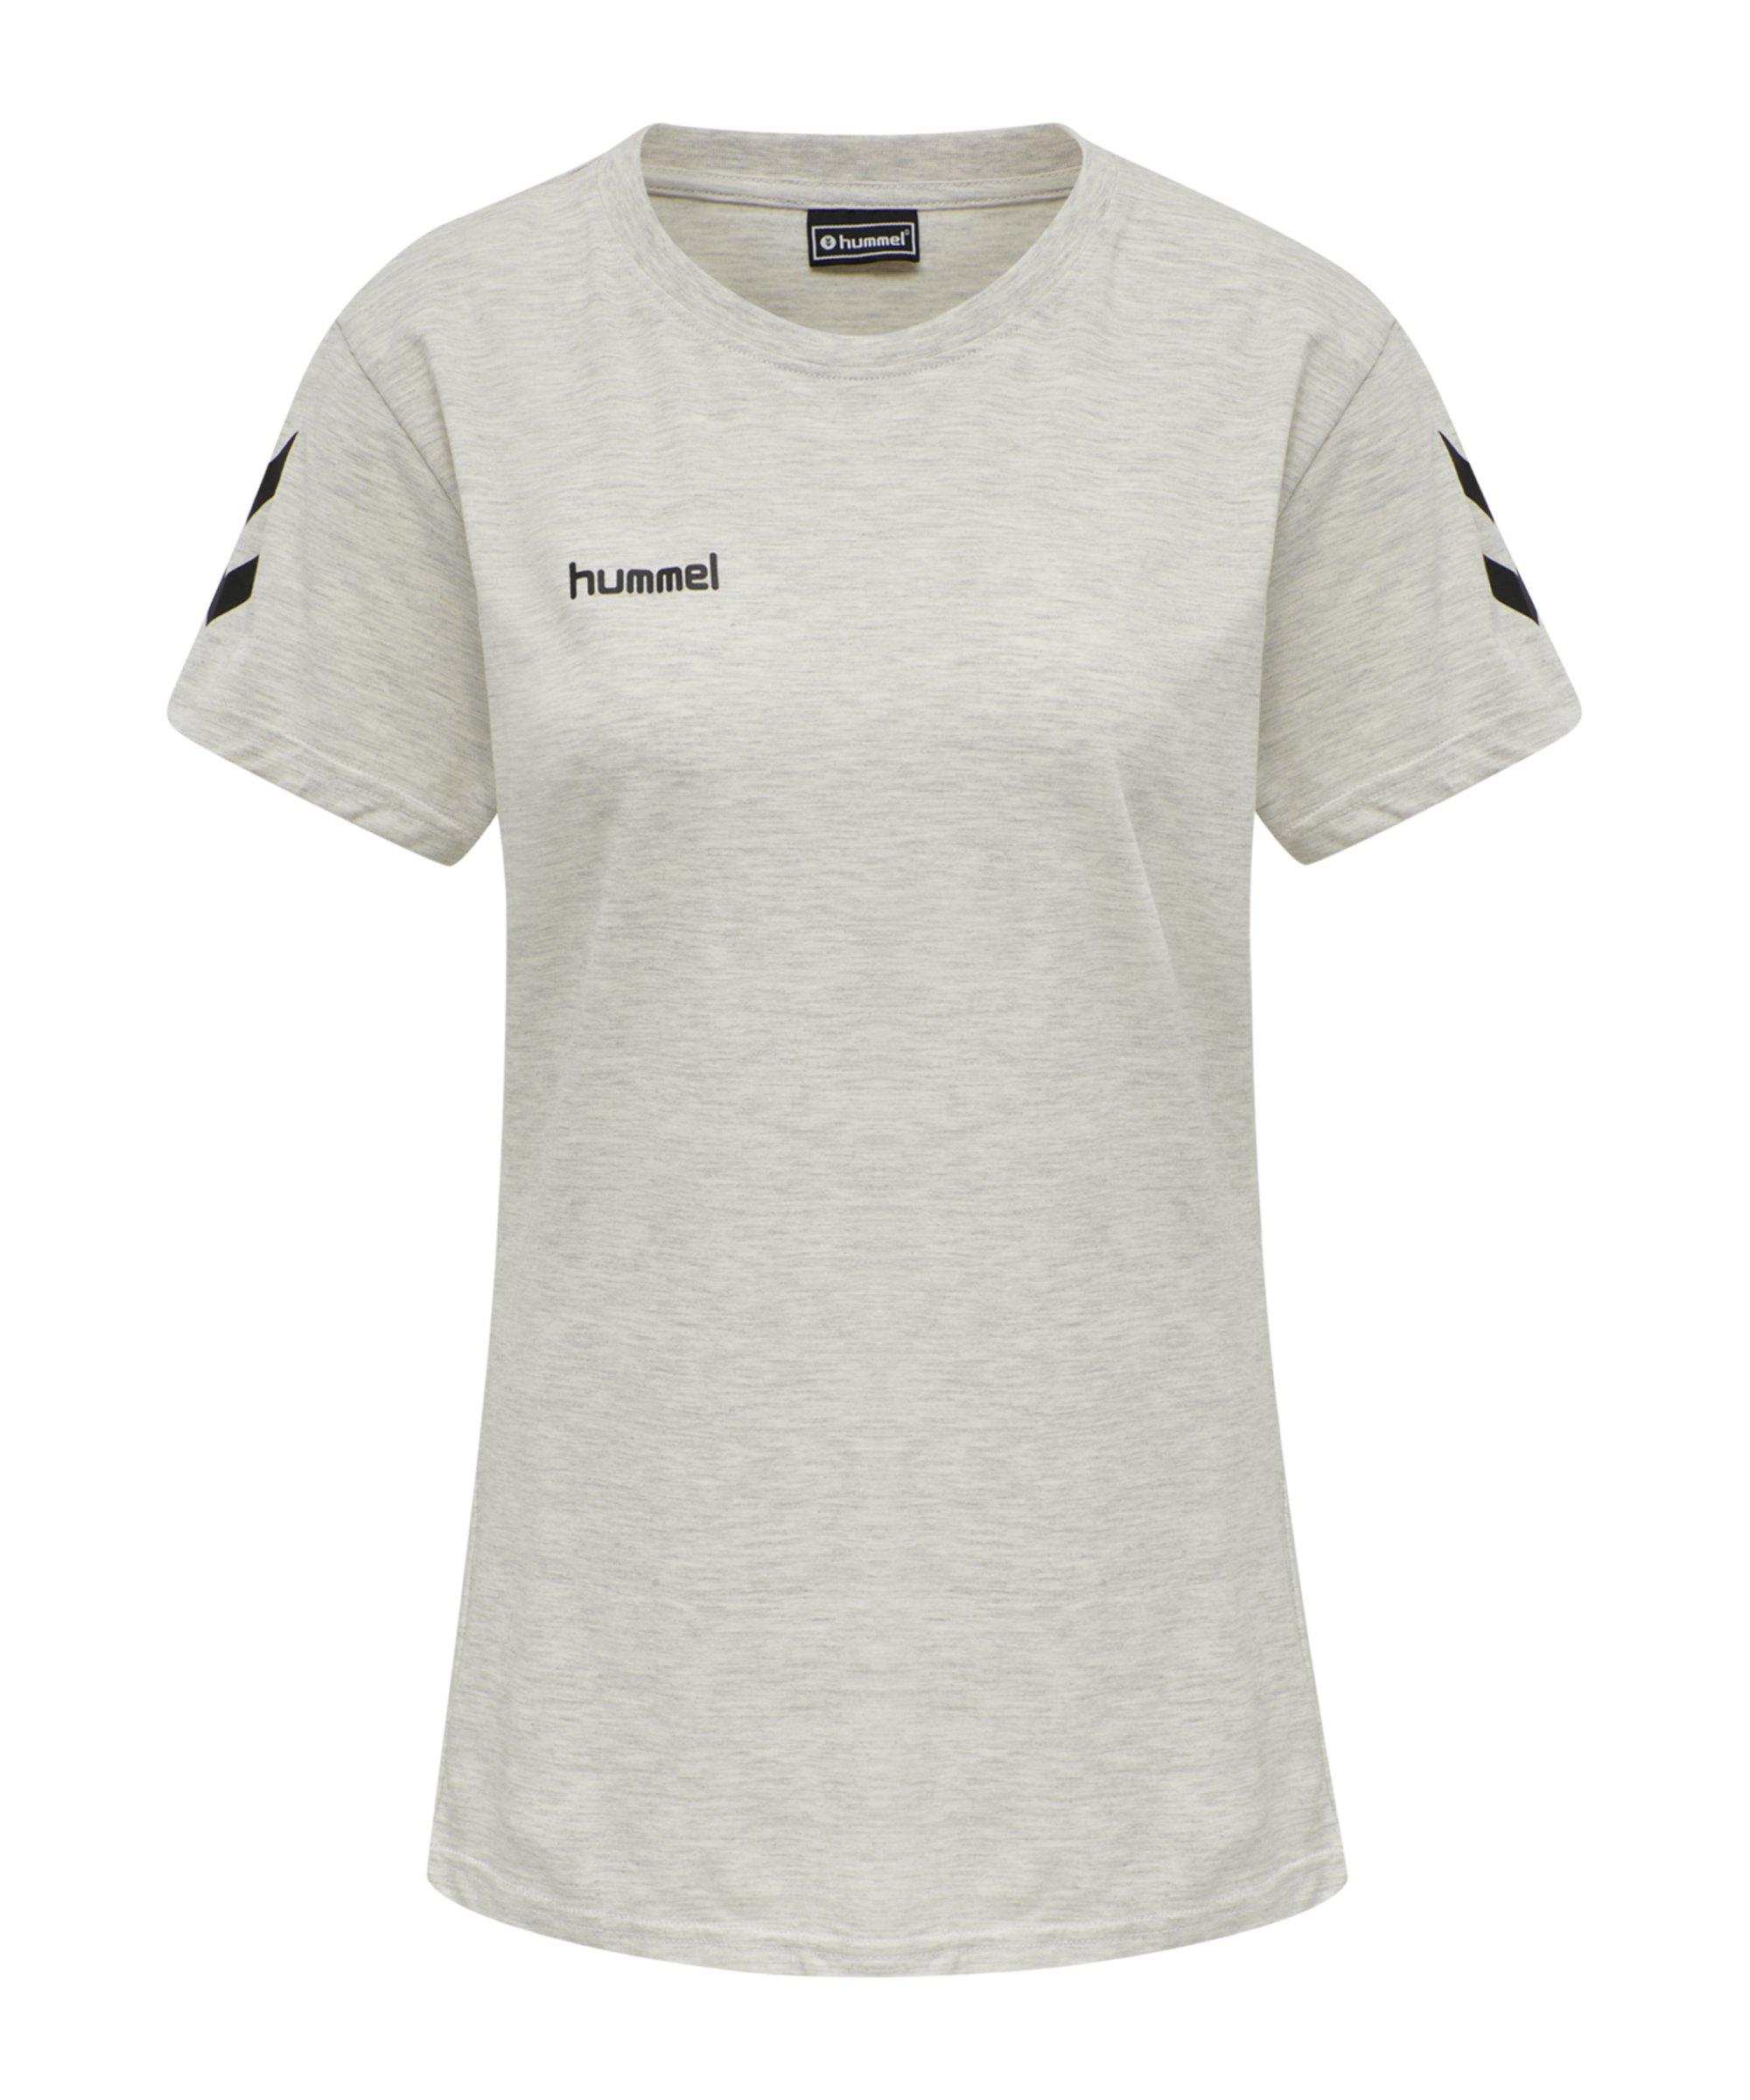 Hummel Cotton T-Shirt Damen Beige F9158 - beige